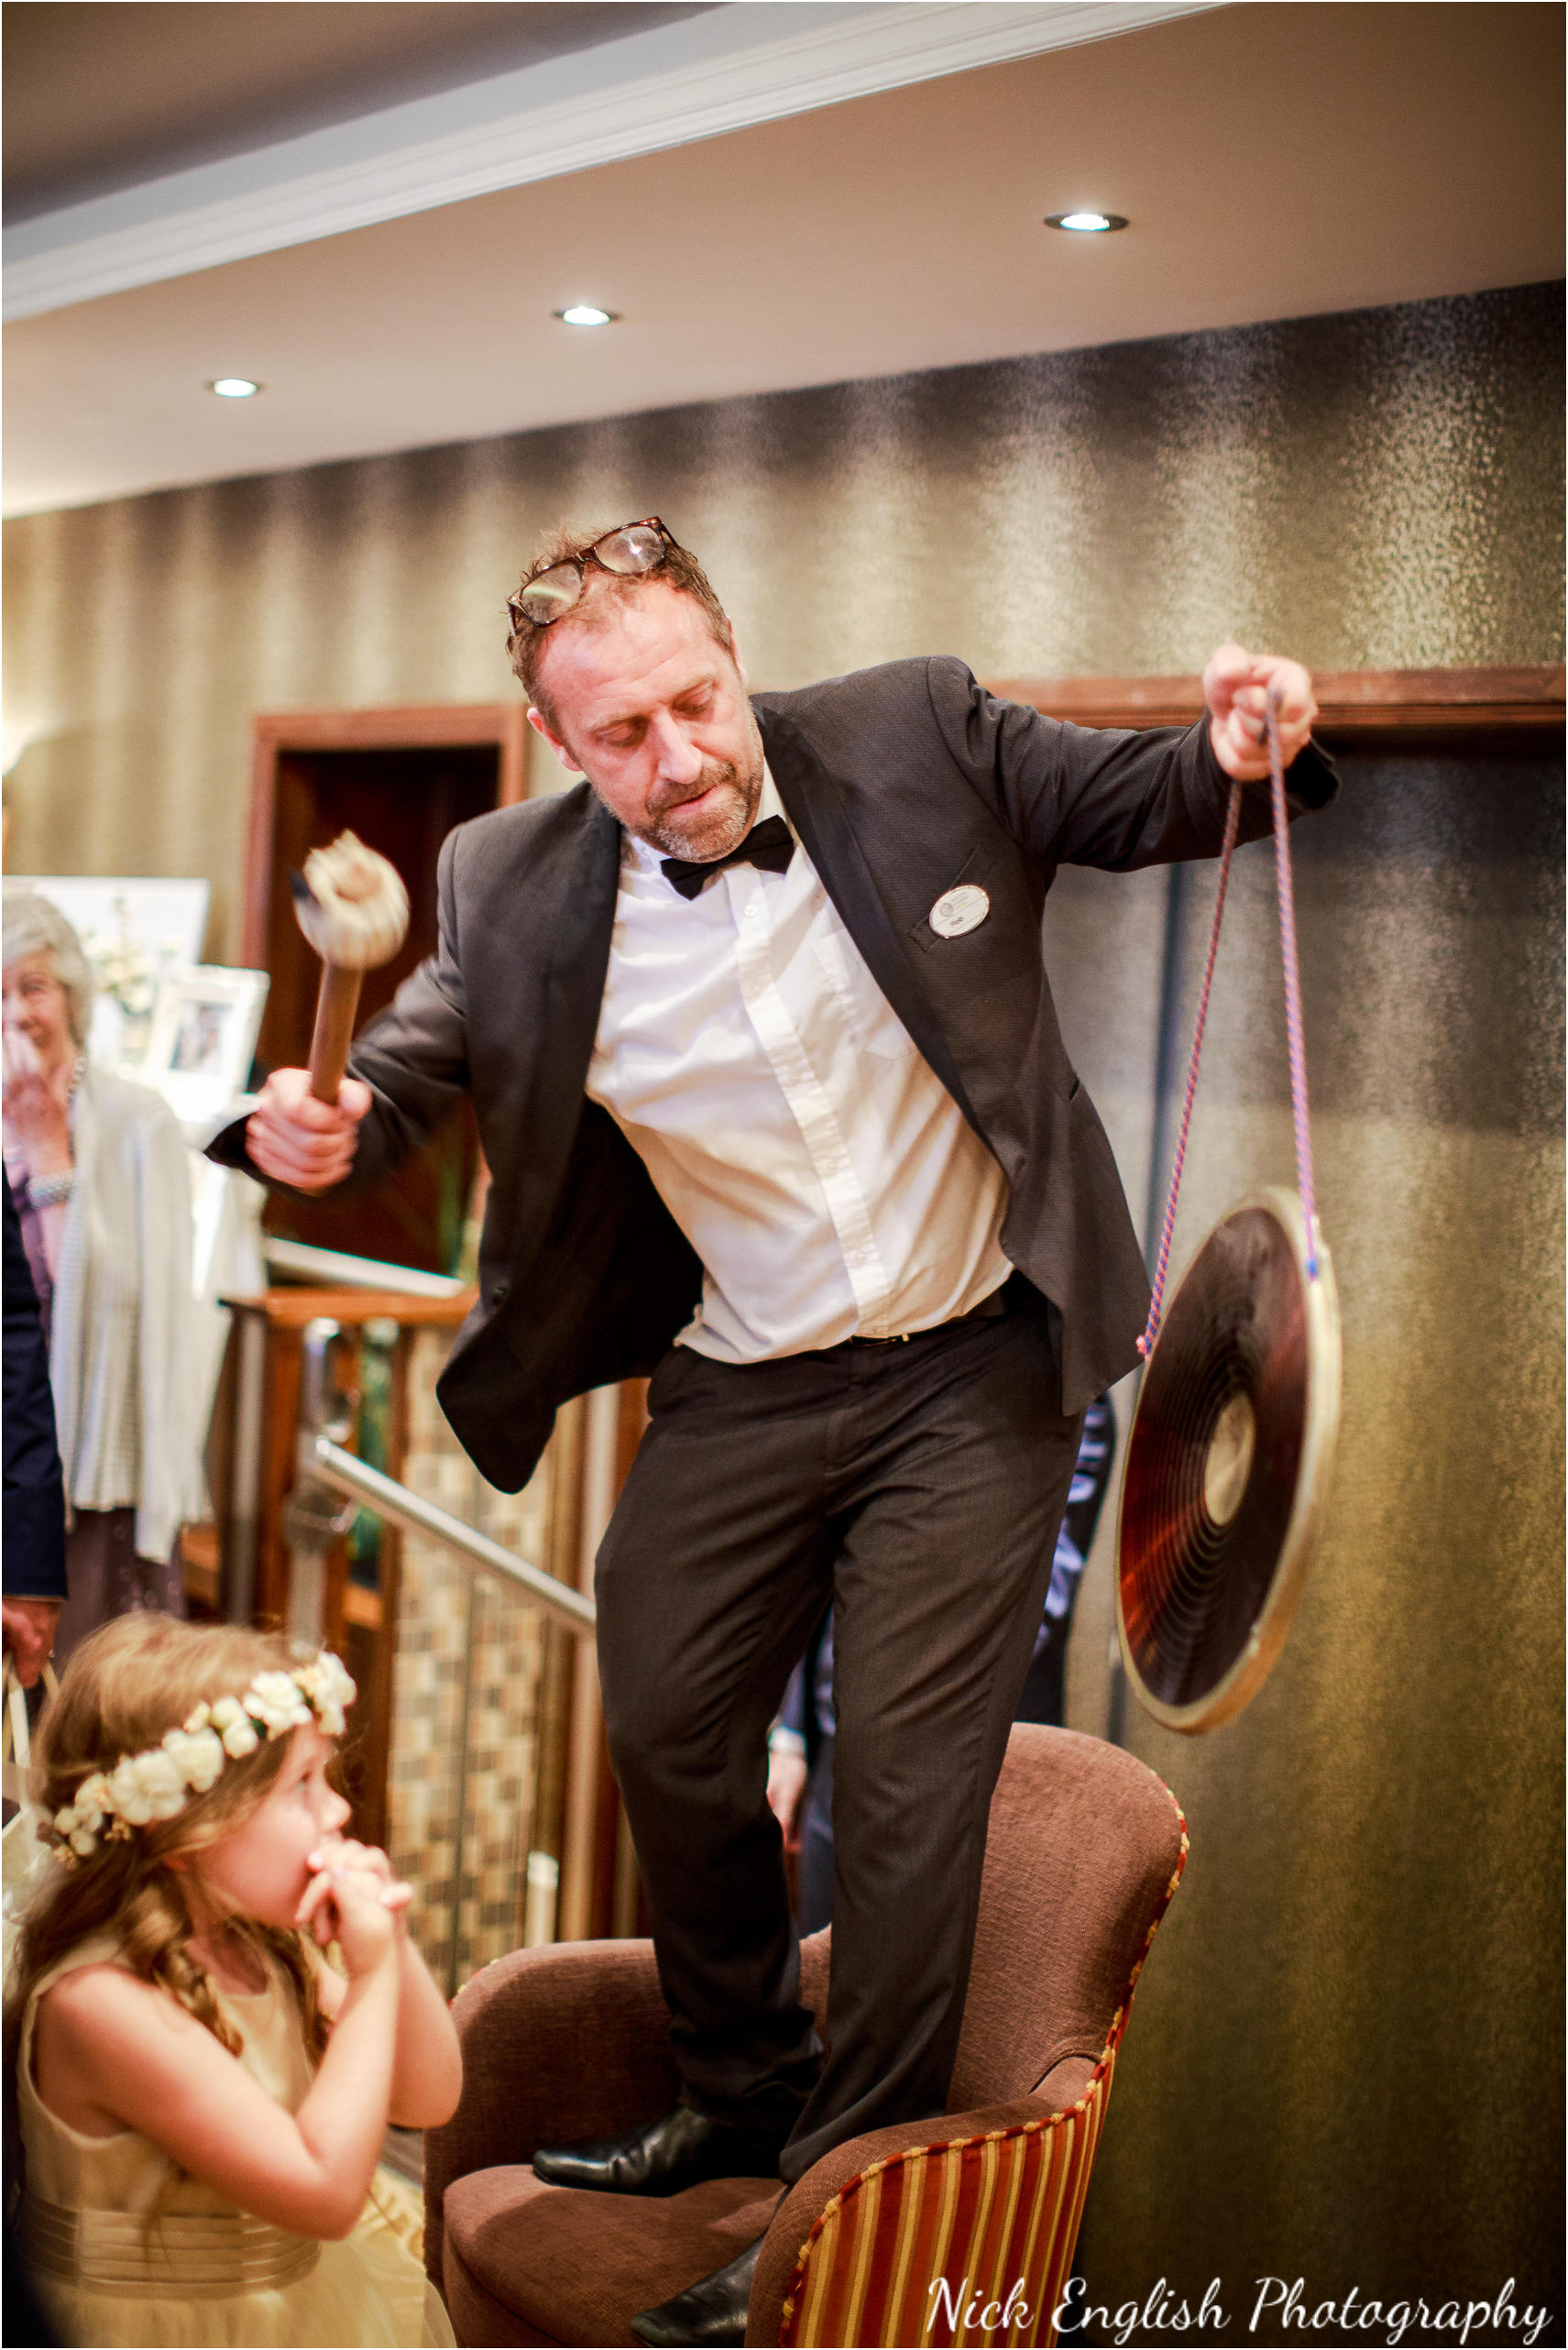 Emily David Wedding Photographs at Barton Grange Preston by Nick English Photography 157jpg.jpeg